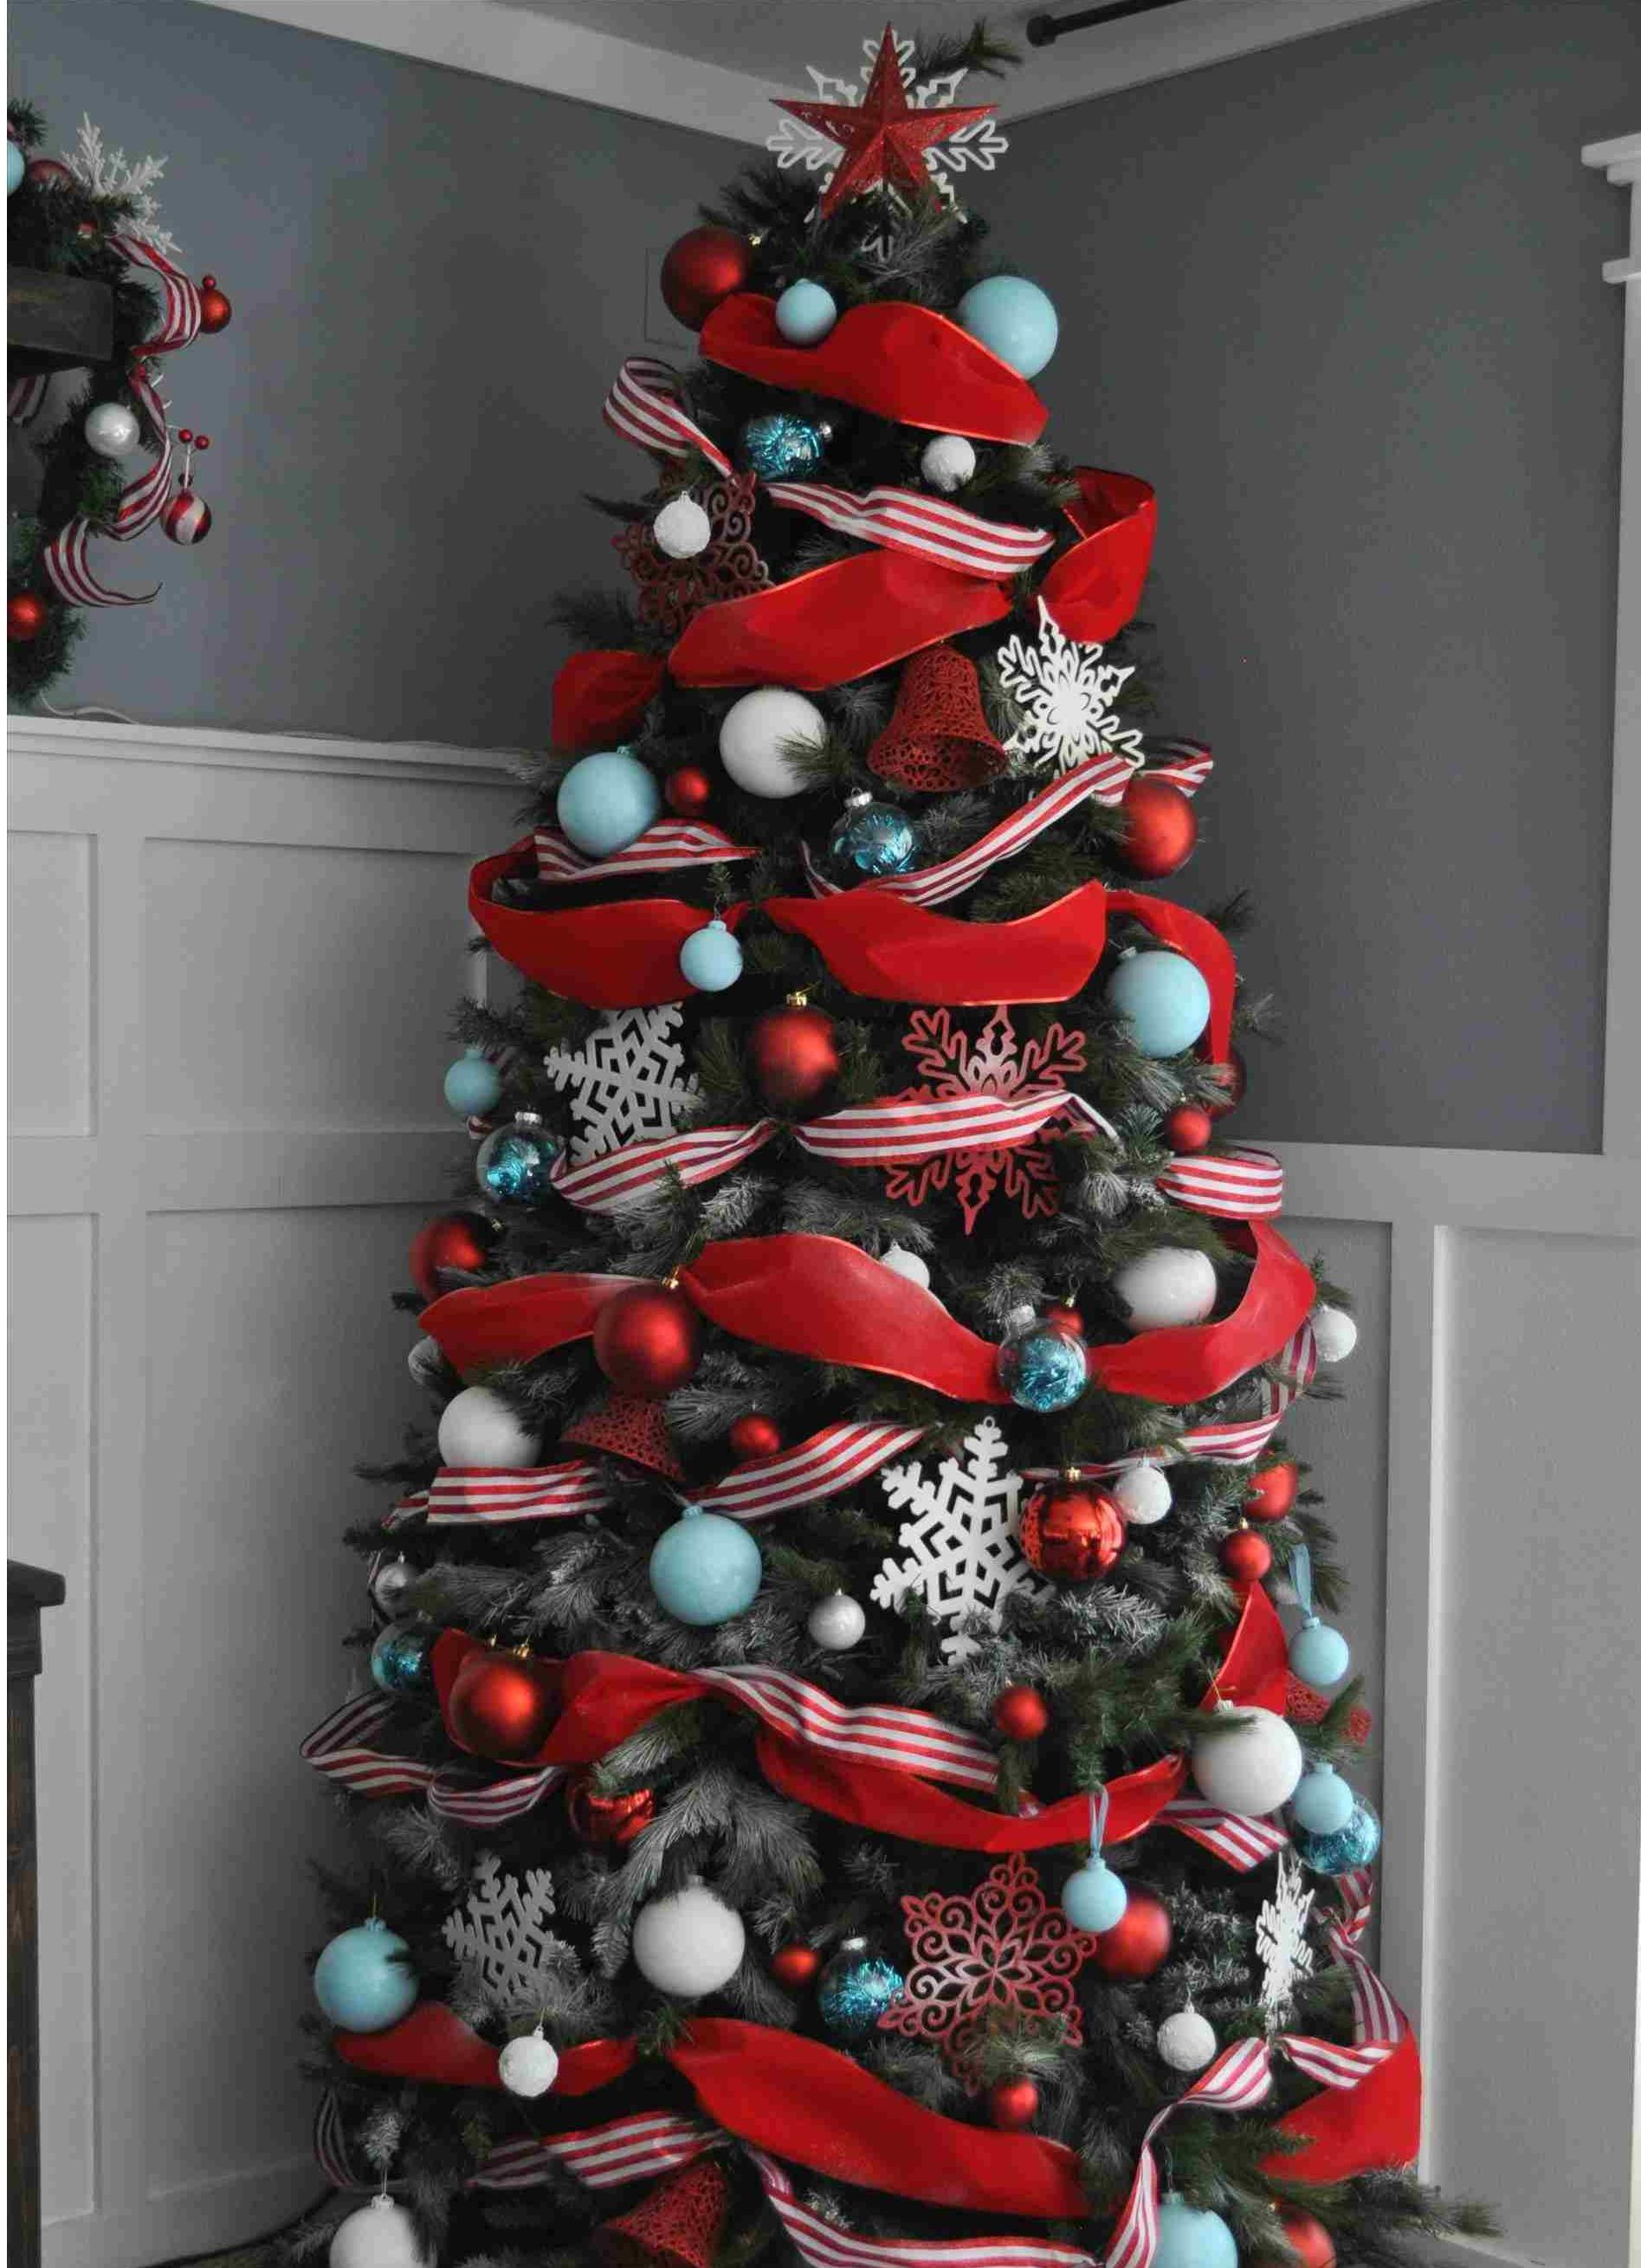 arbre de noël en rouge et bleu